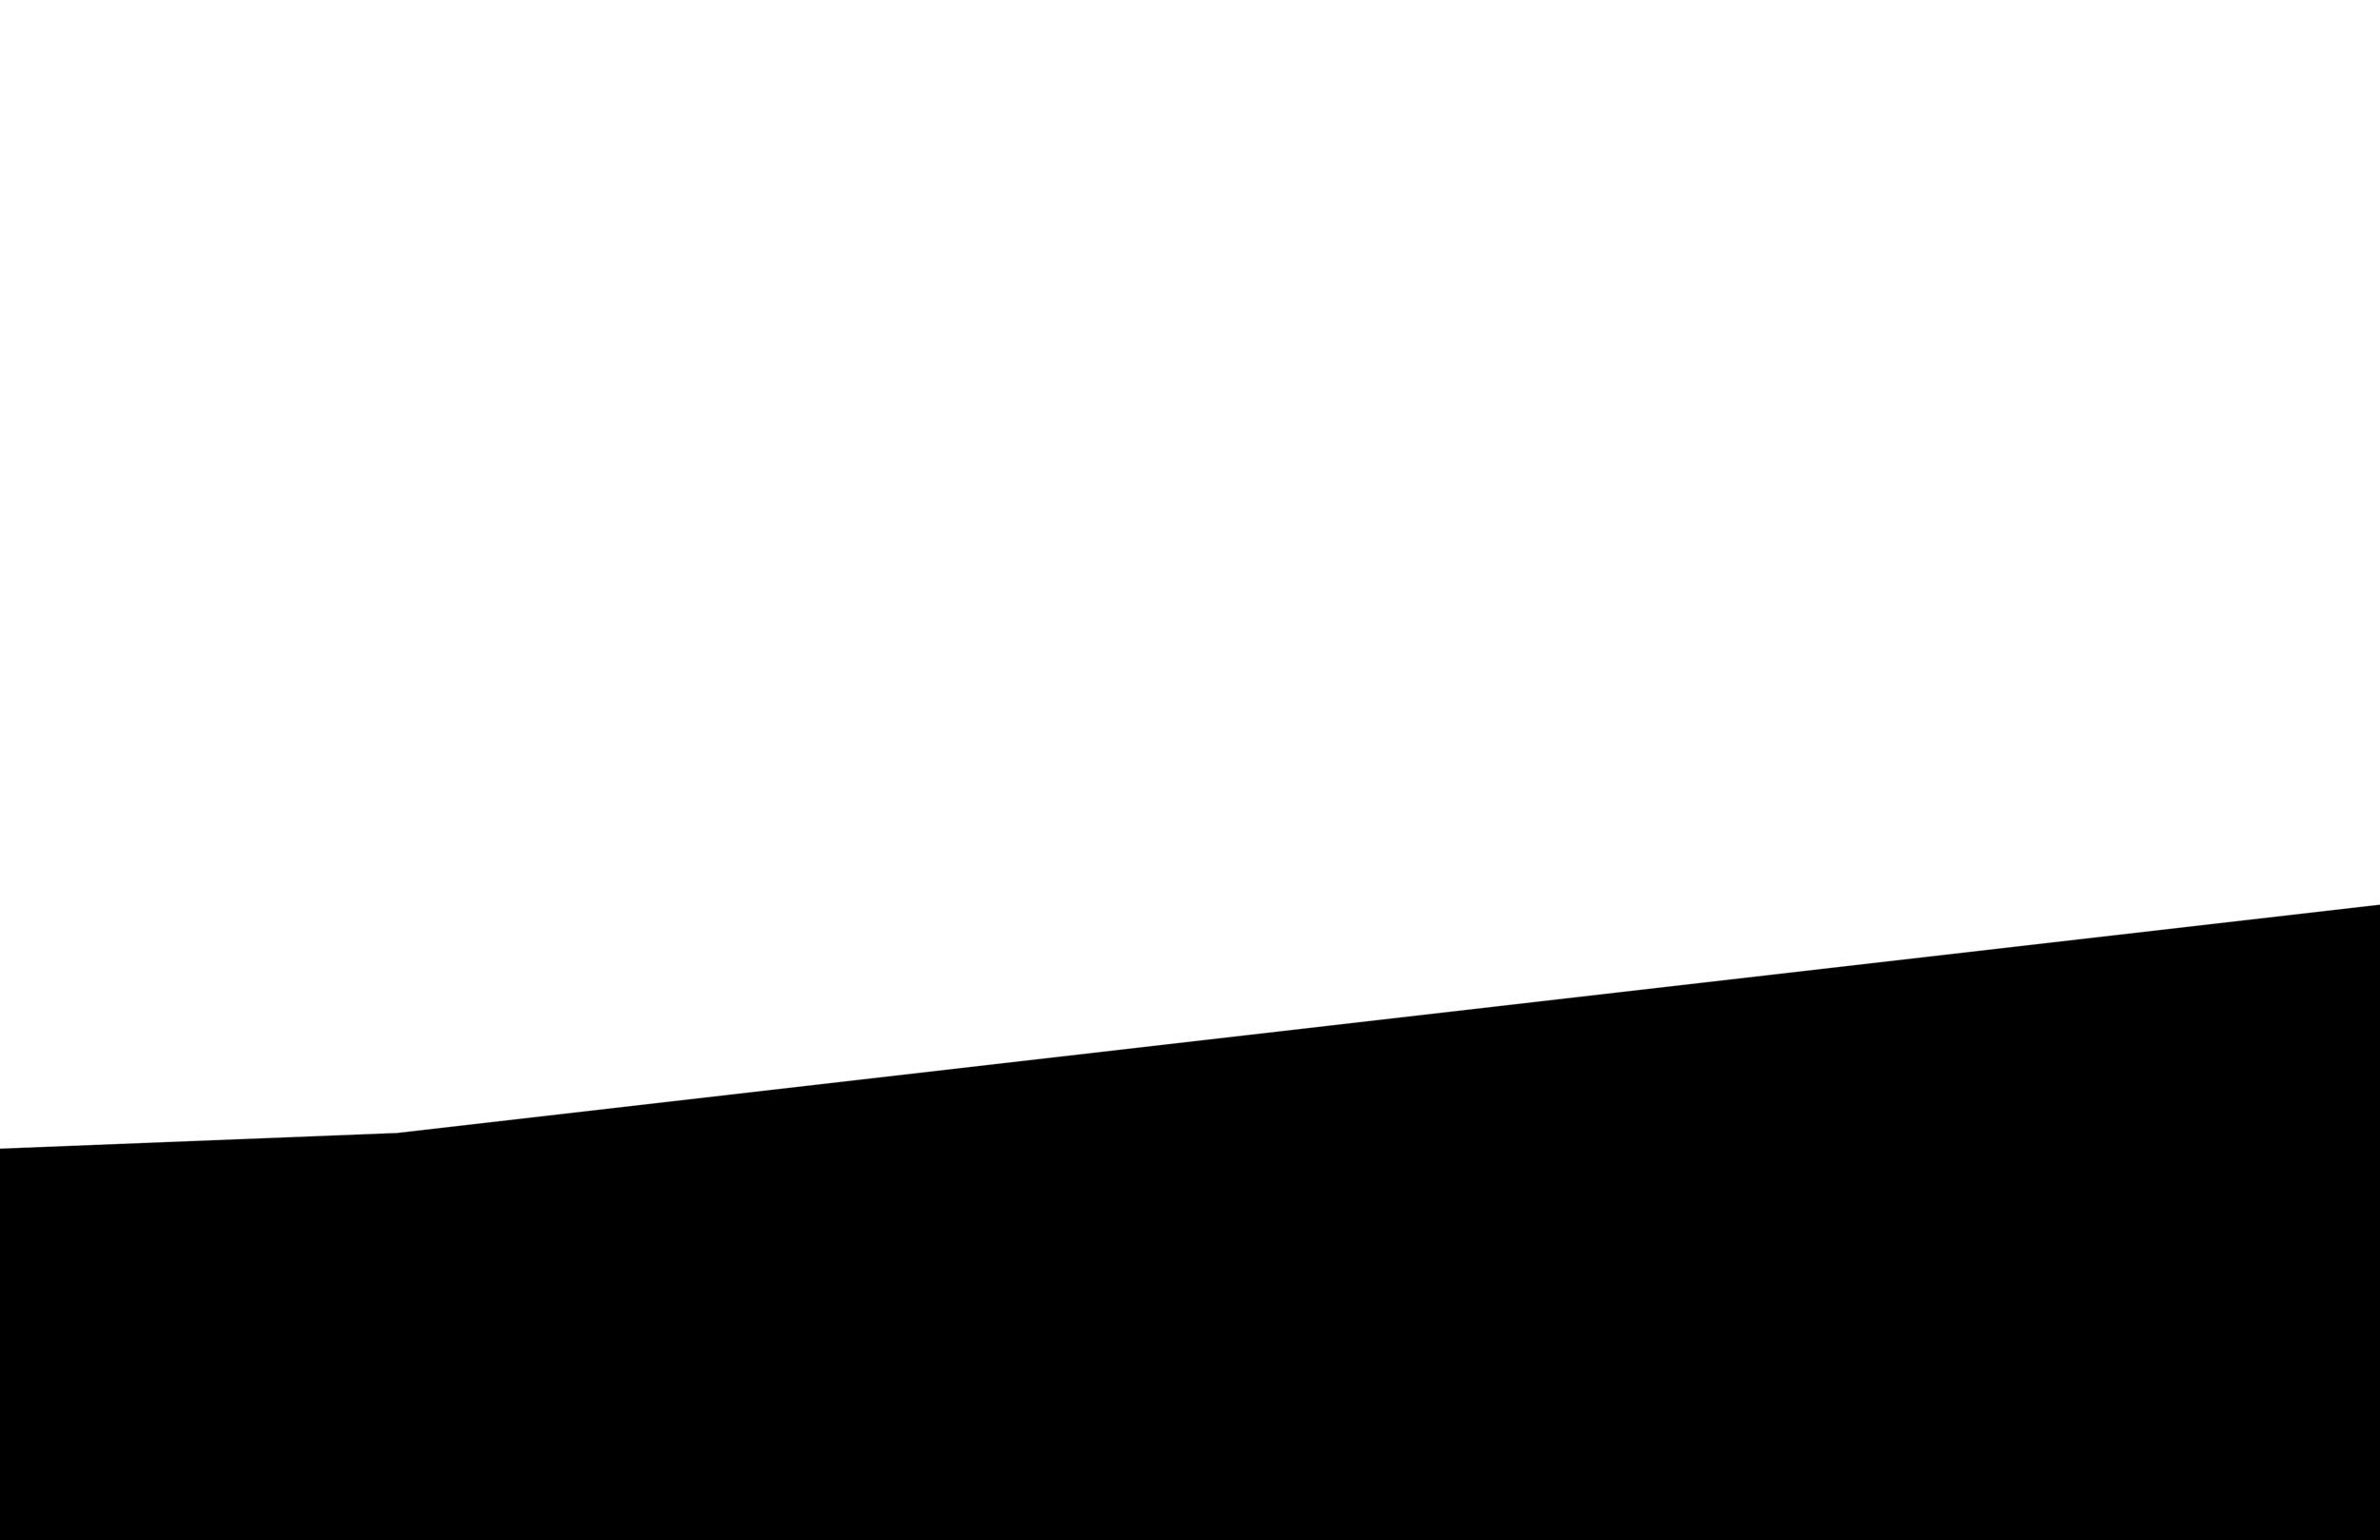 2302 G STREET - Diagram 1.jpg